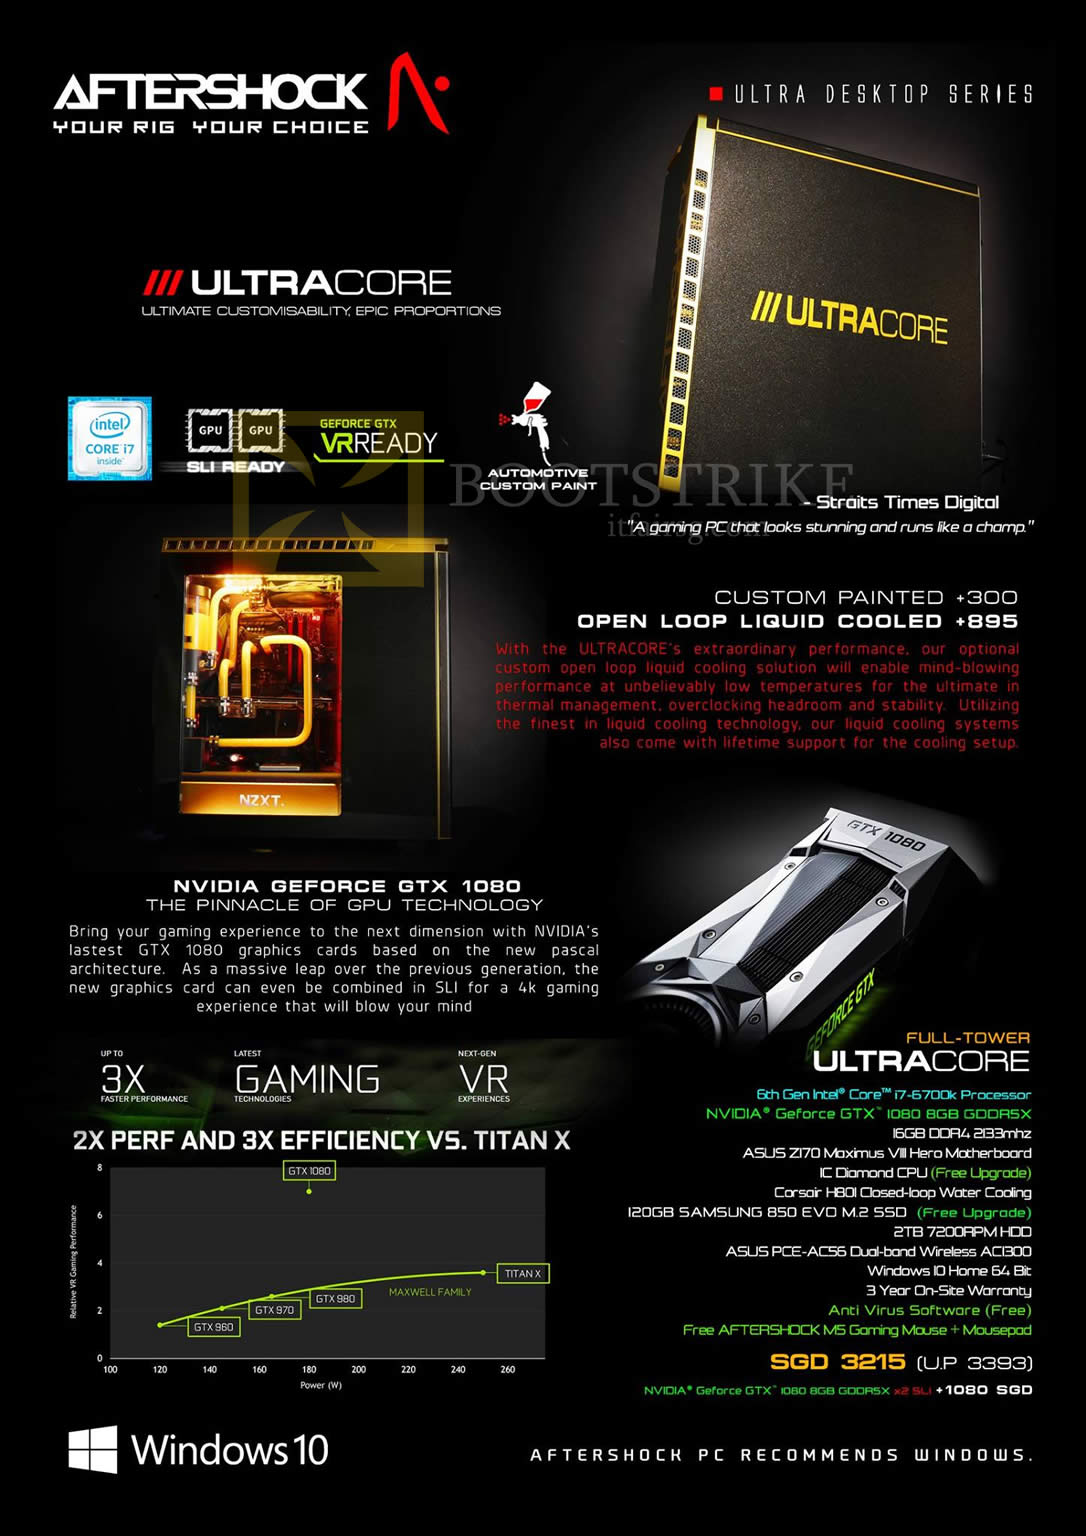 COMEX 2016 price list image brochure of Aftershock Desktop Ultra Series Ultracore